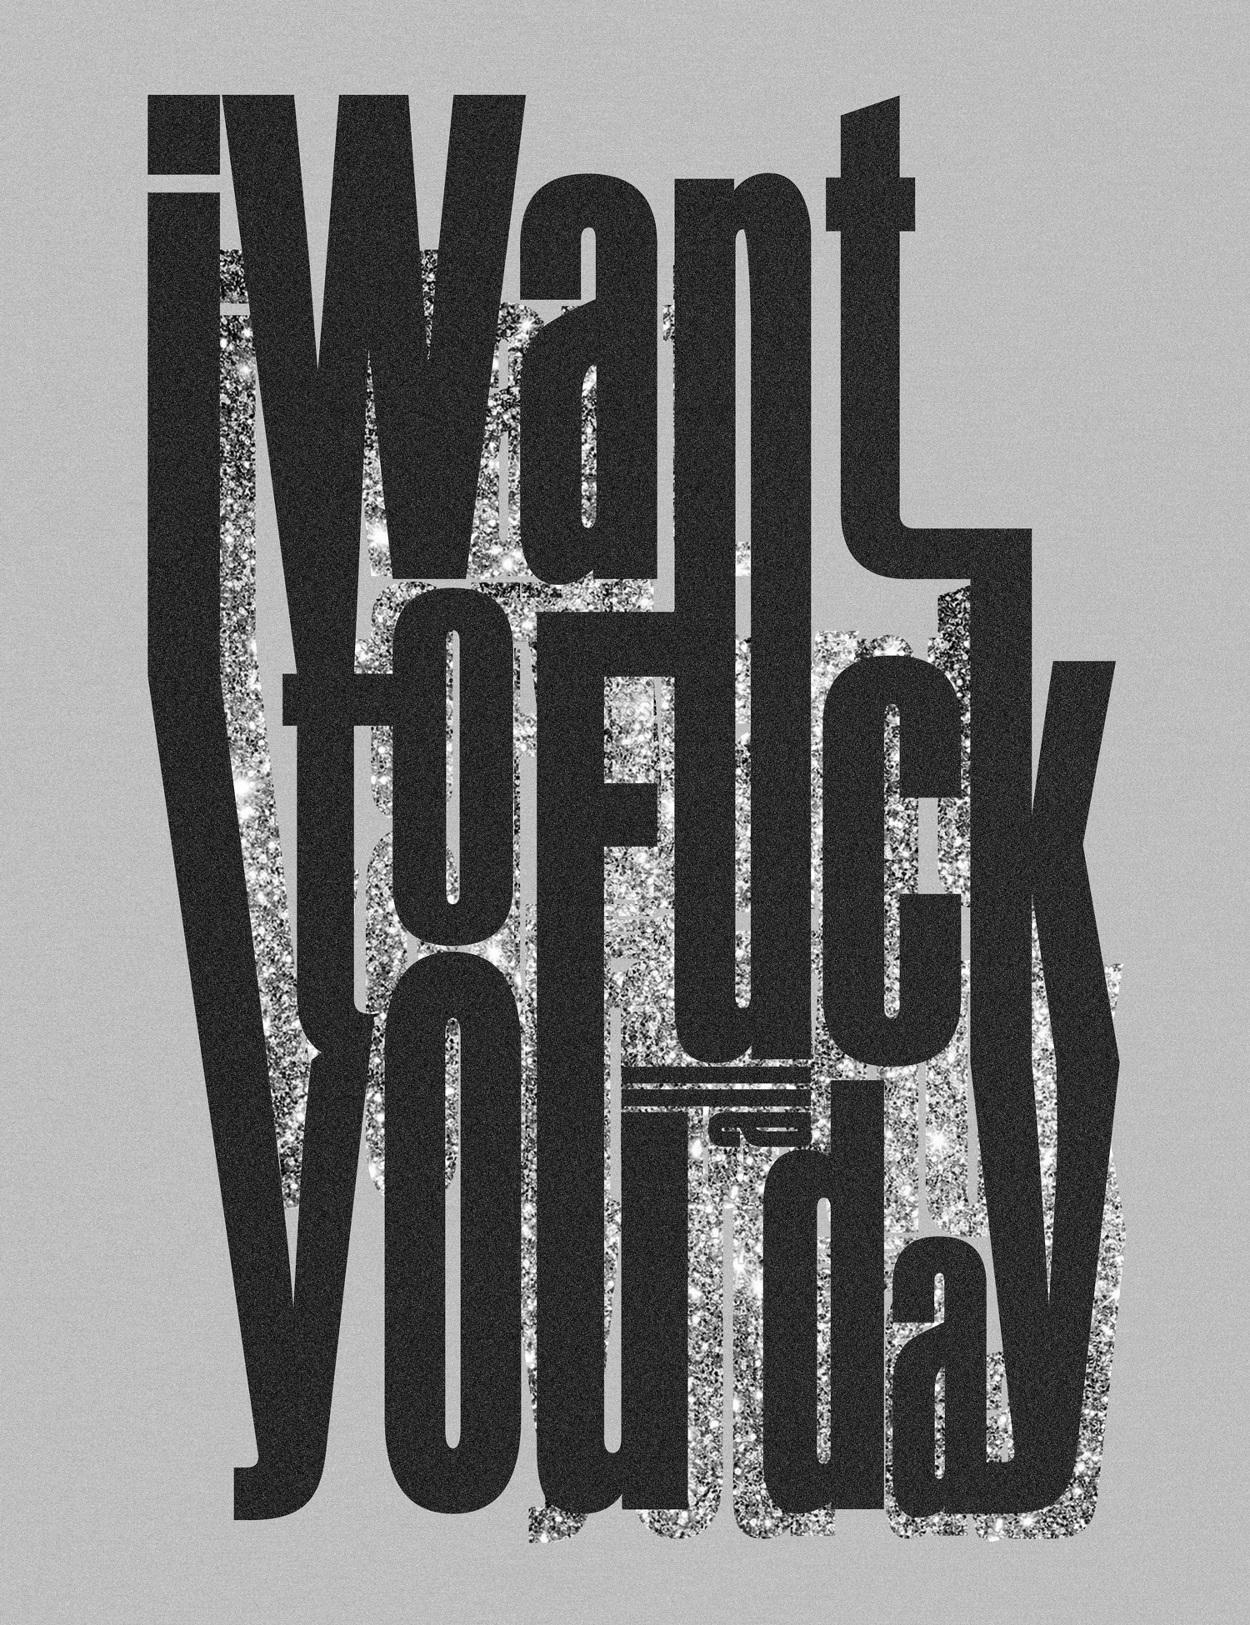 Words Pantelis Vitaliotis Magneto